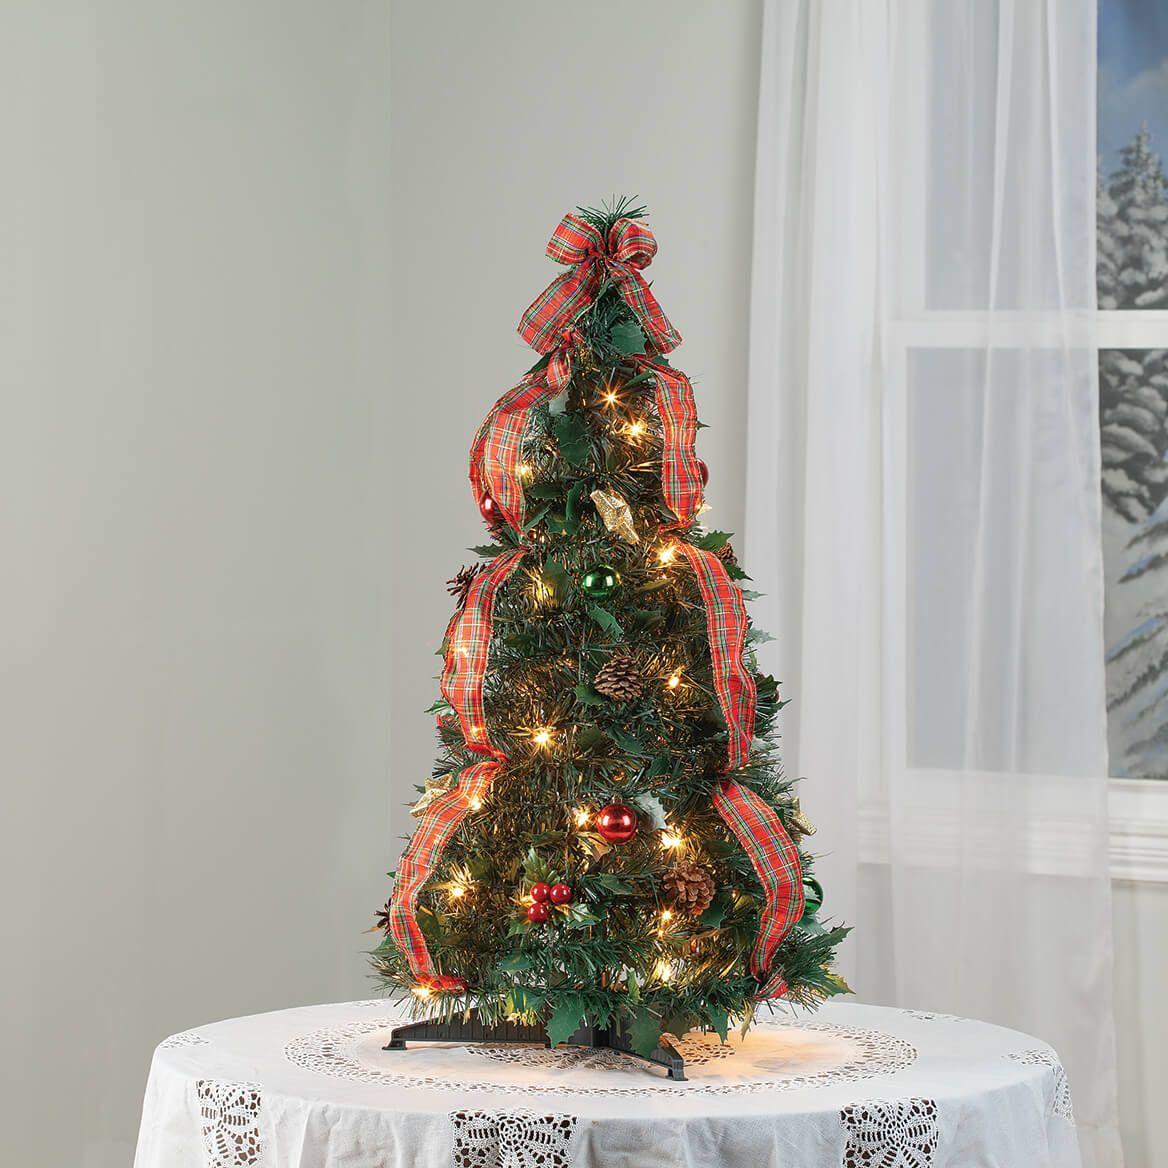 3' Plaid Pull-Up Tree by Holiday Peak™-370702